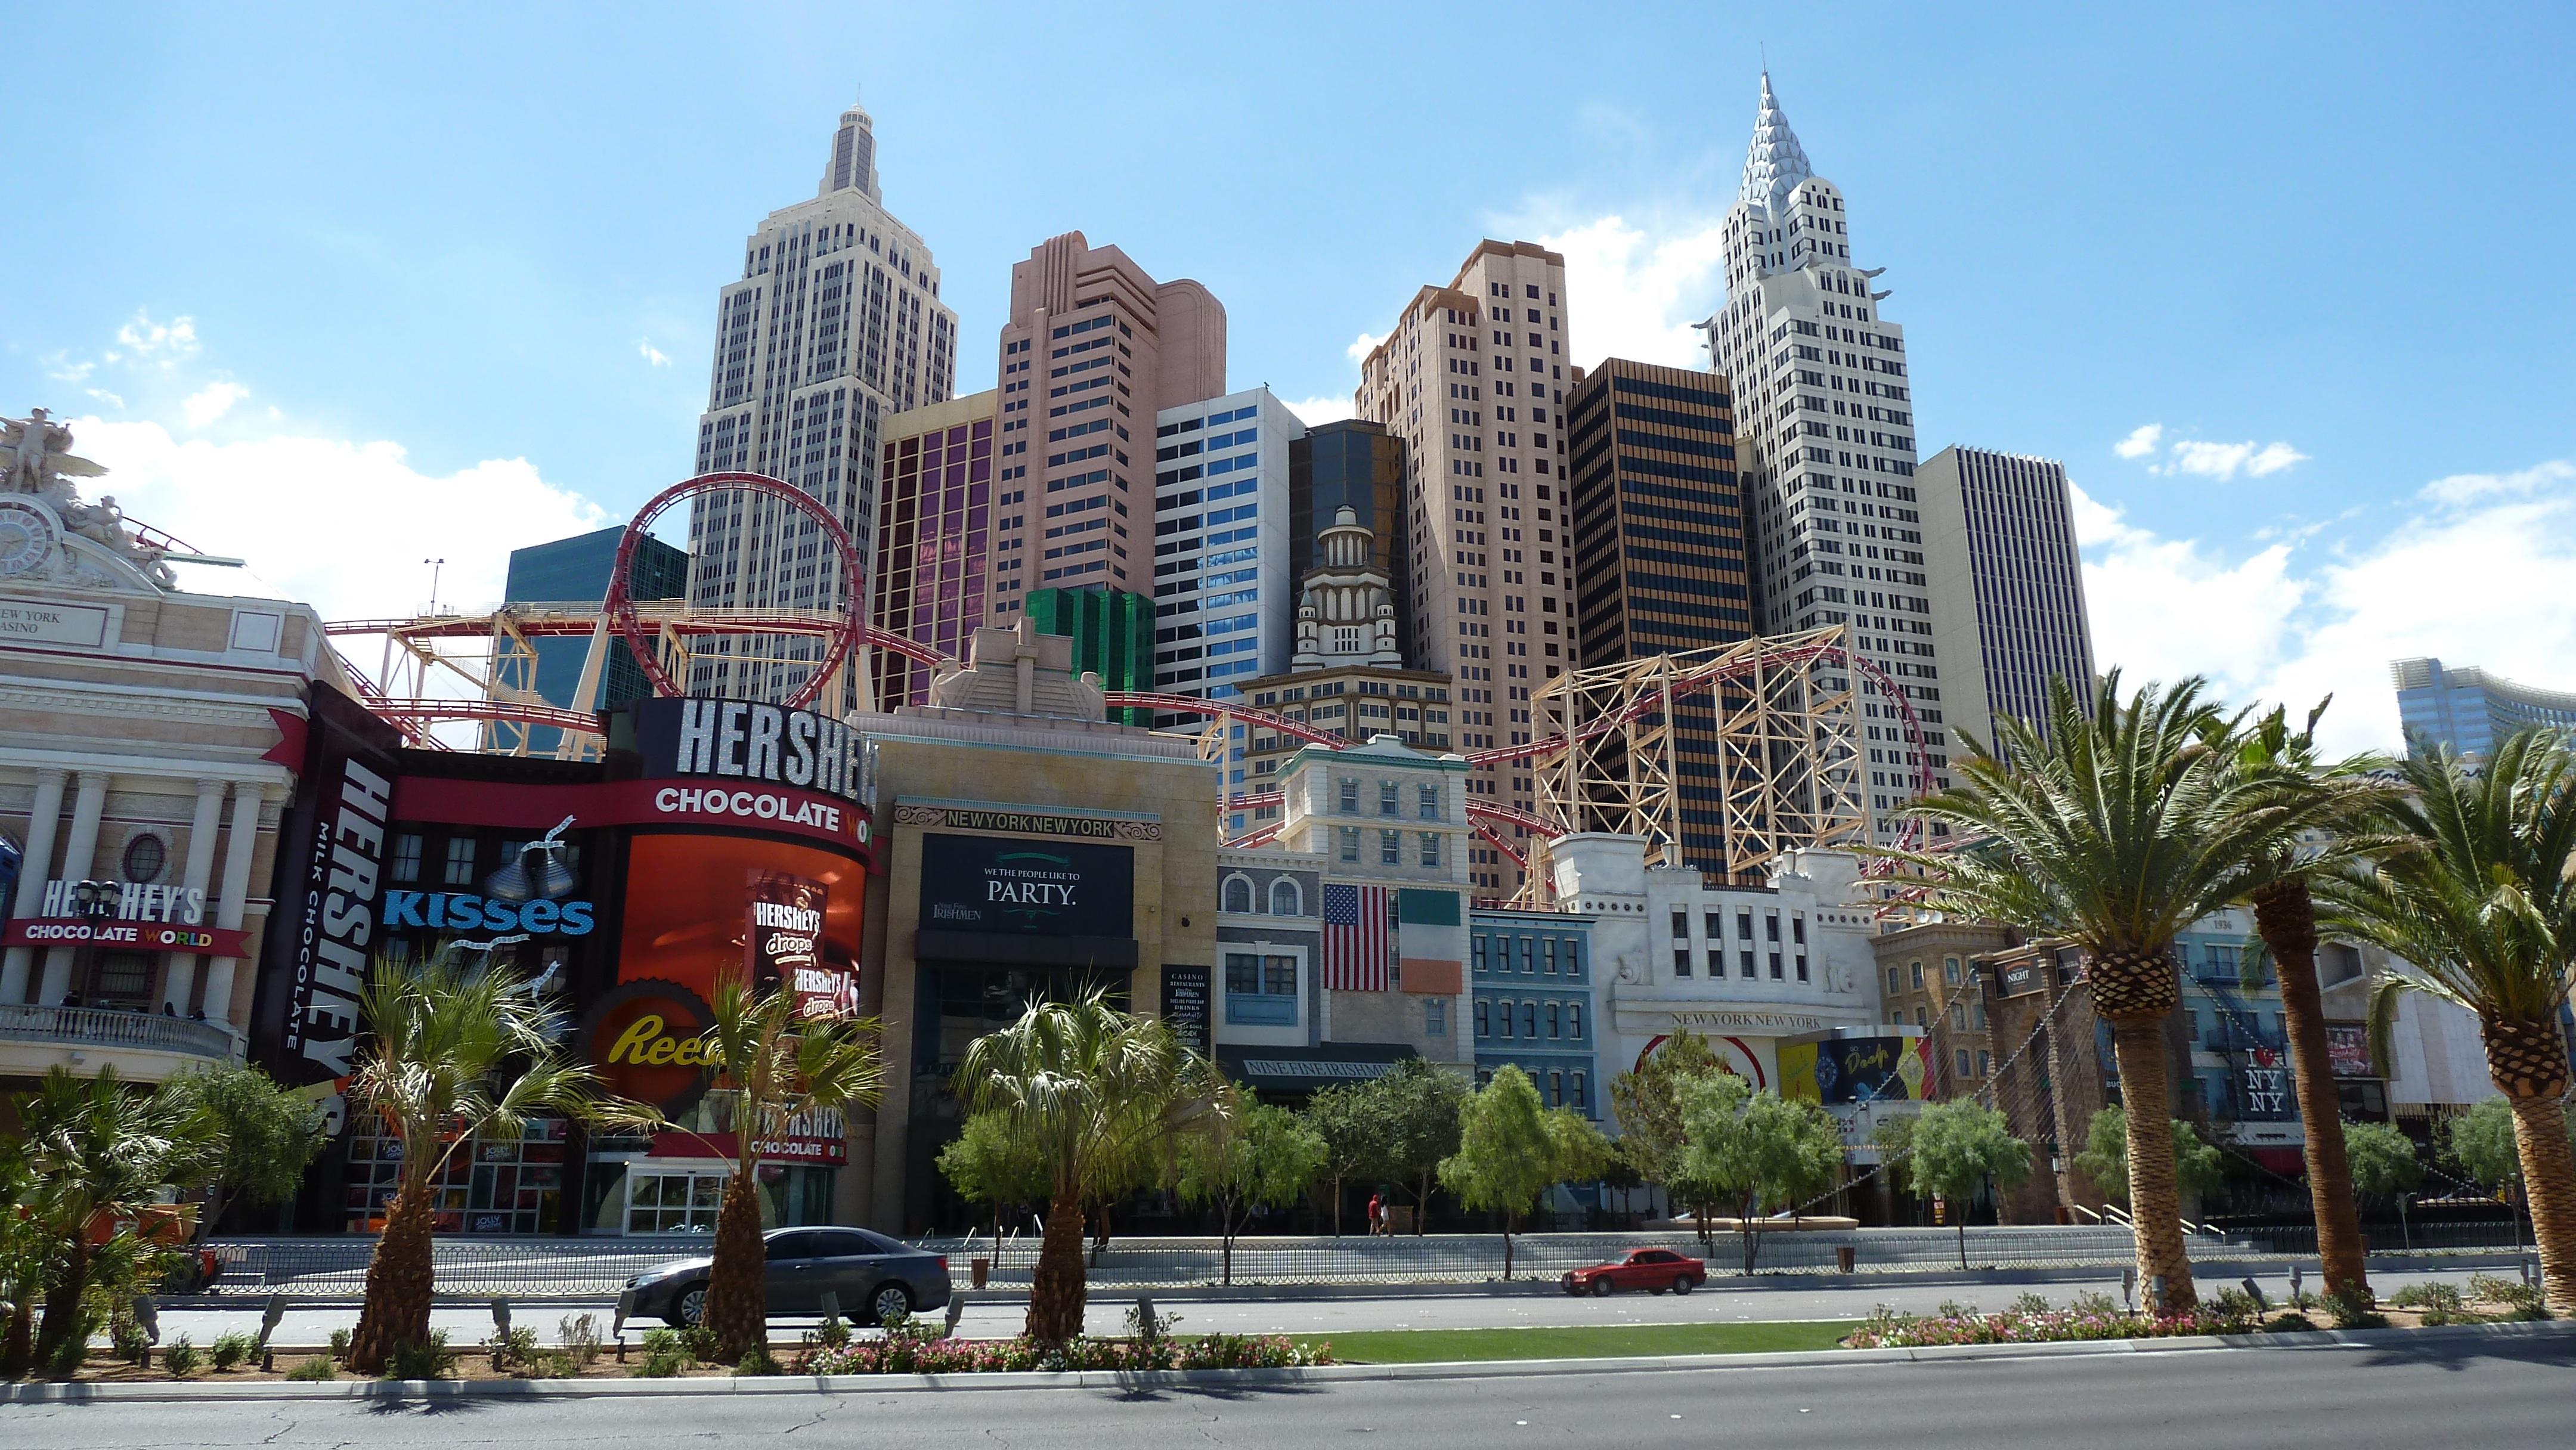 ... gamble, hotel, resort, casino, entertainment, strip, metropolis, condominium, neighbourhood, las vegas, street view, residential area, human settlement, ...